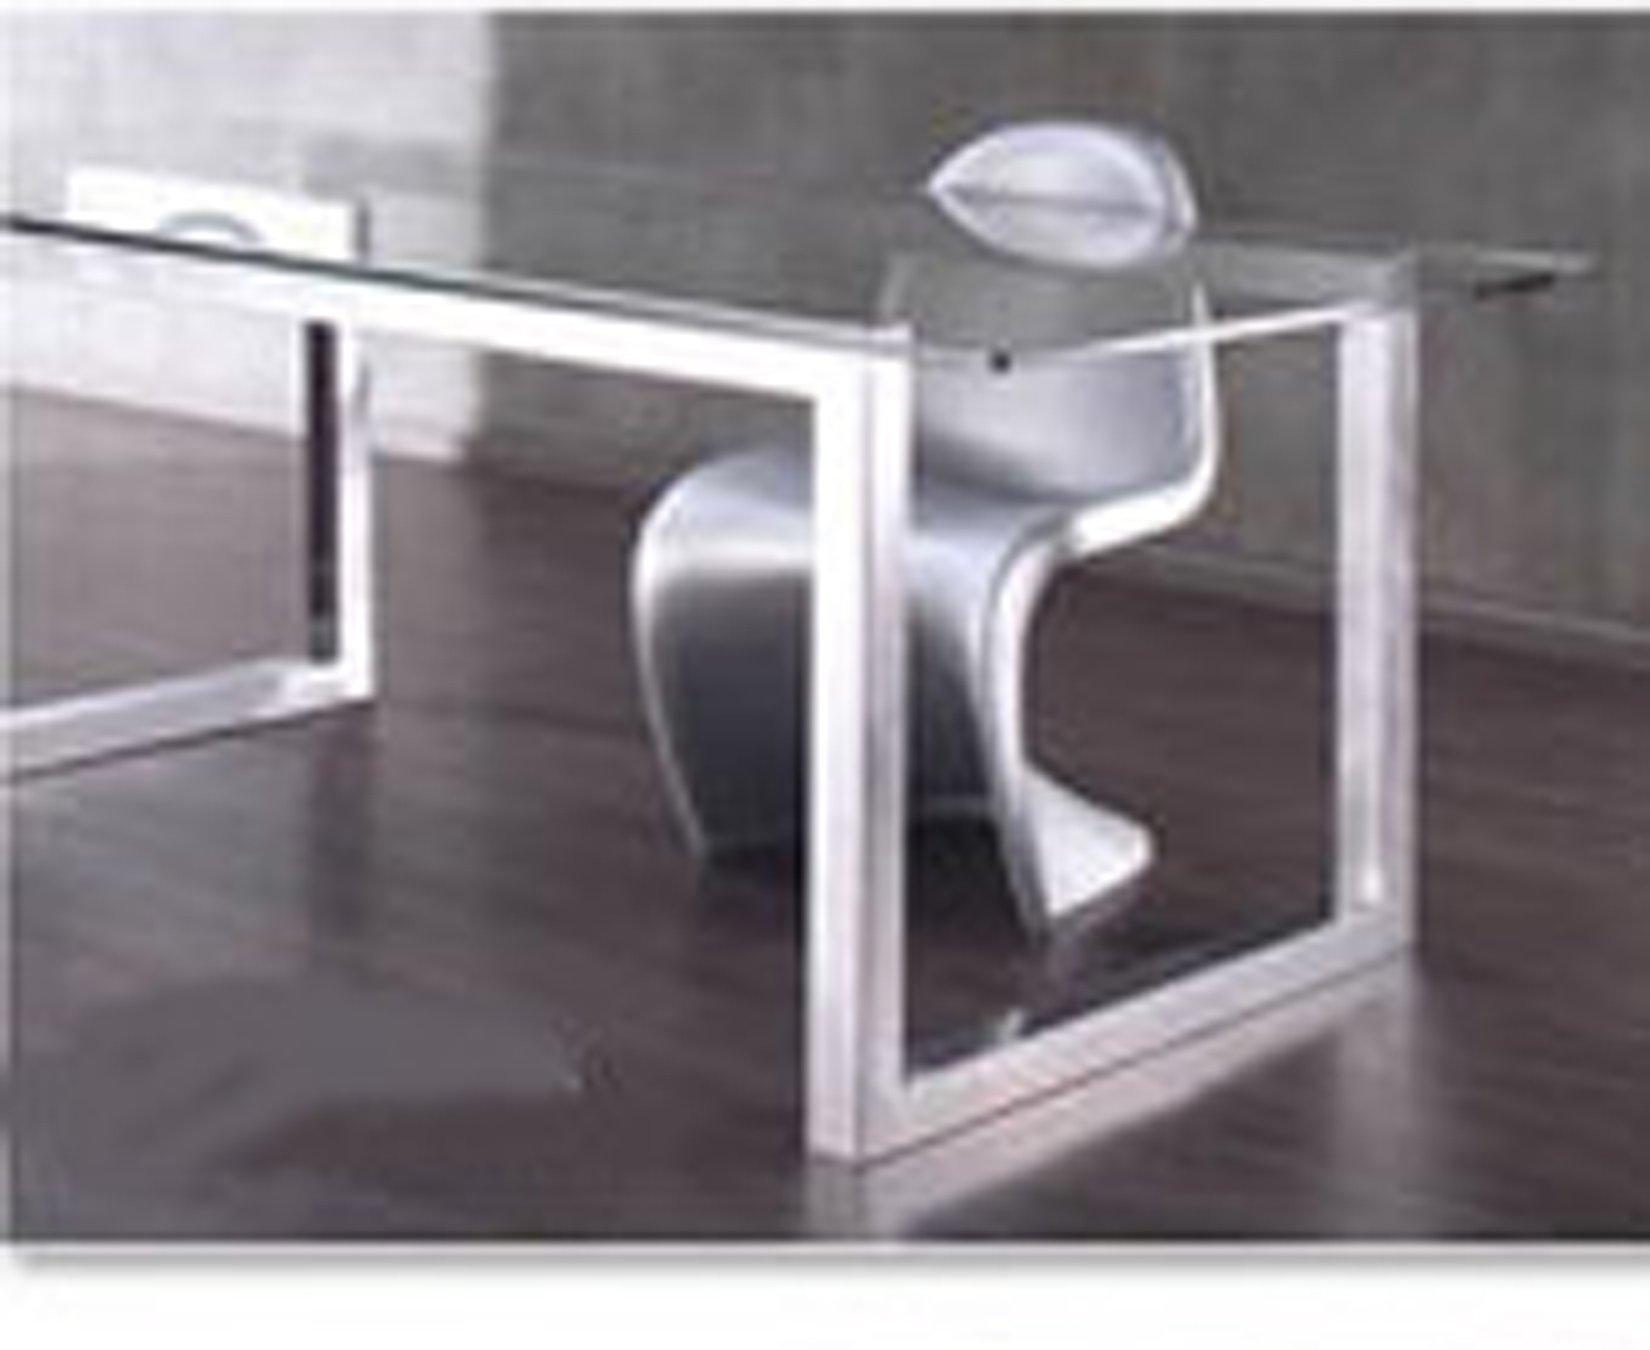 Mesa Londion en acero Inoxidable - www.muebles.com ®